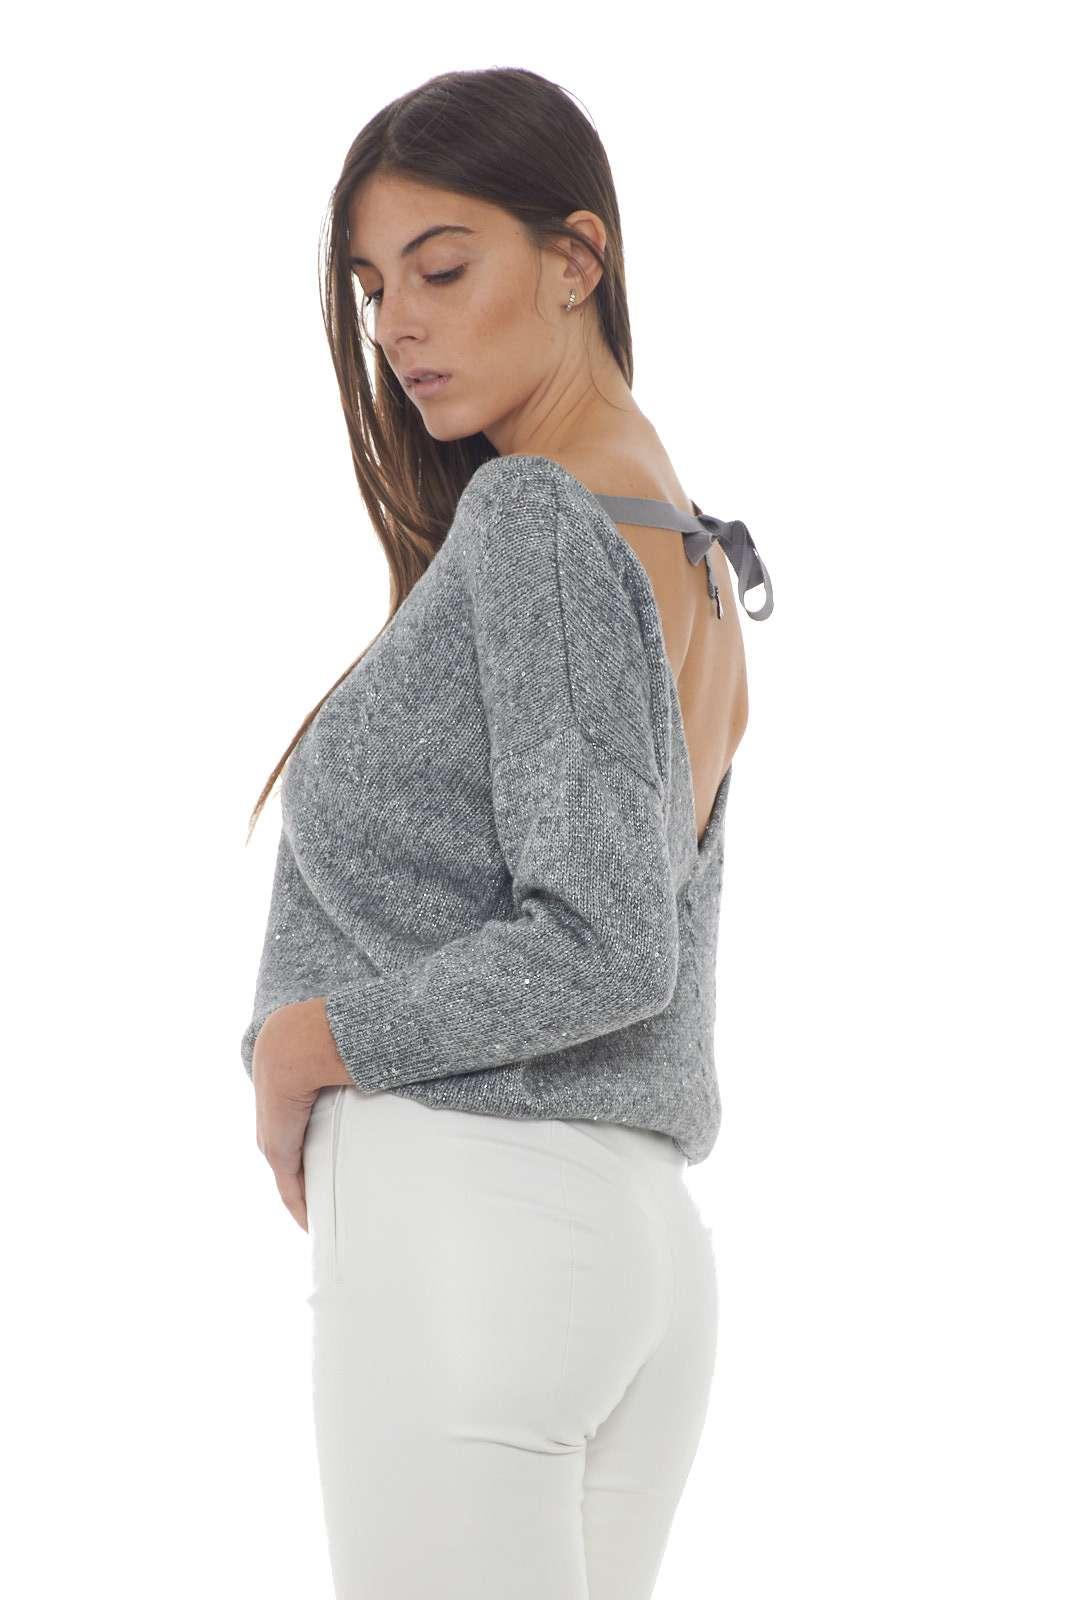 https://www.parmax.com/media/catalog/product/a/i/AI-outlet_parmax-maglia-donna-Patrizia-Pepe-8j0898-B.jpg